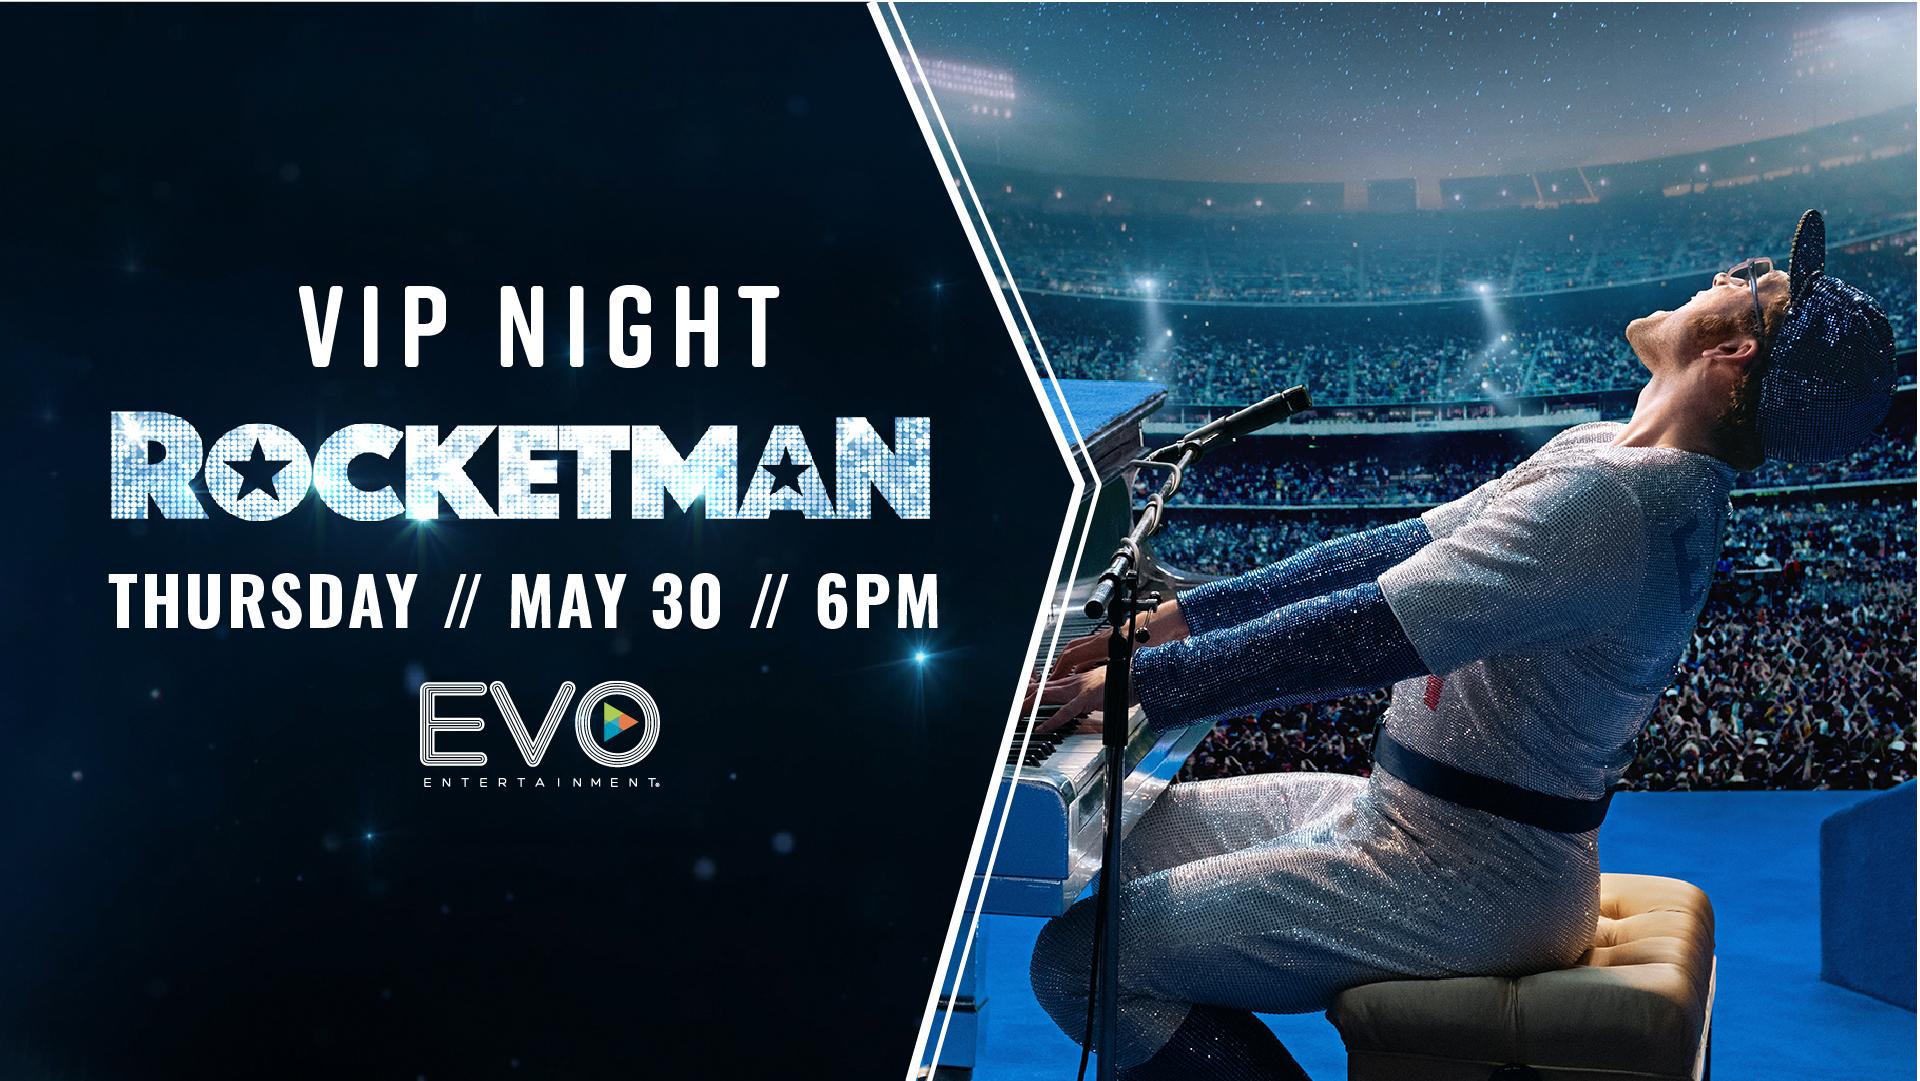 Evo Entertainment Rocketman Vip Night